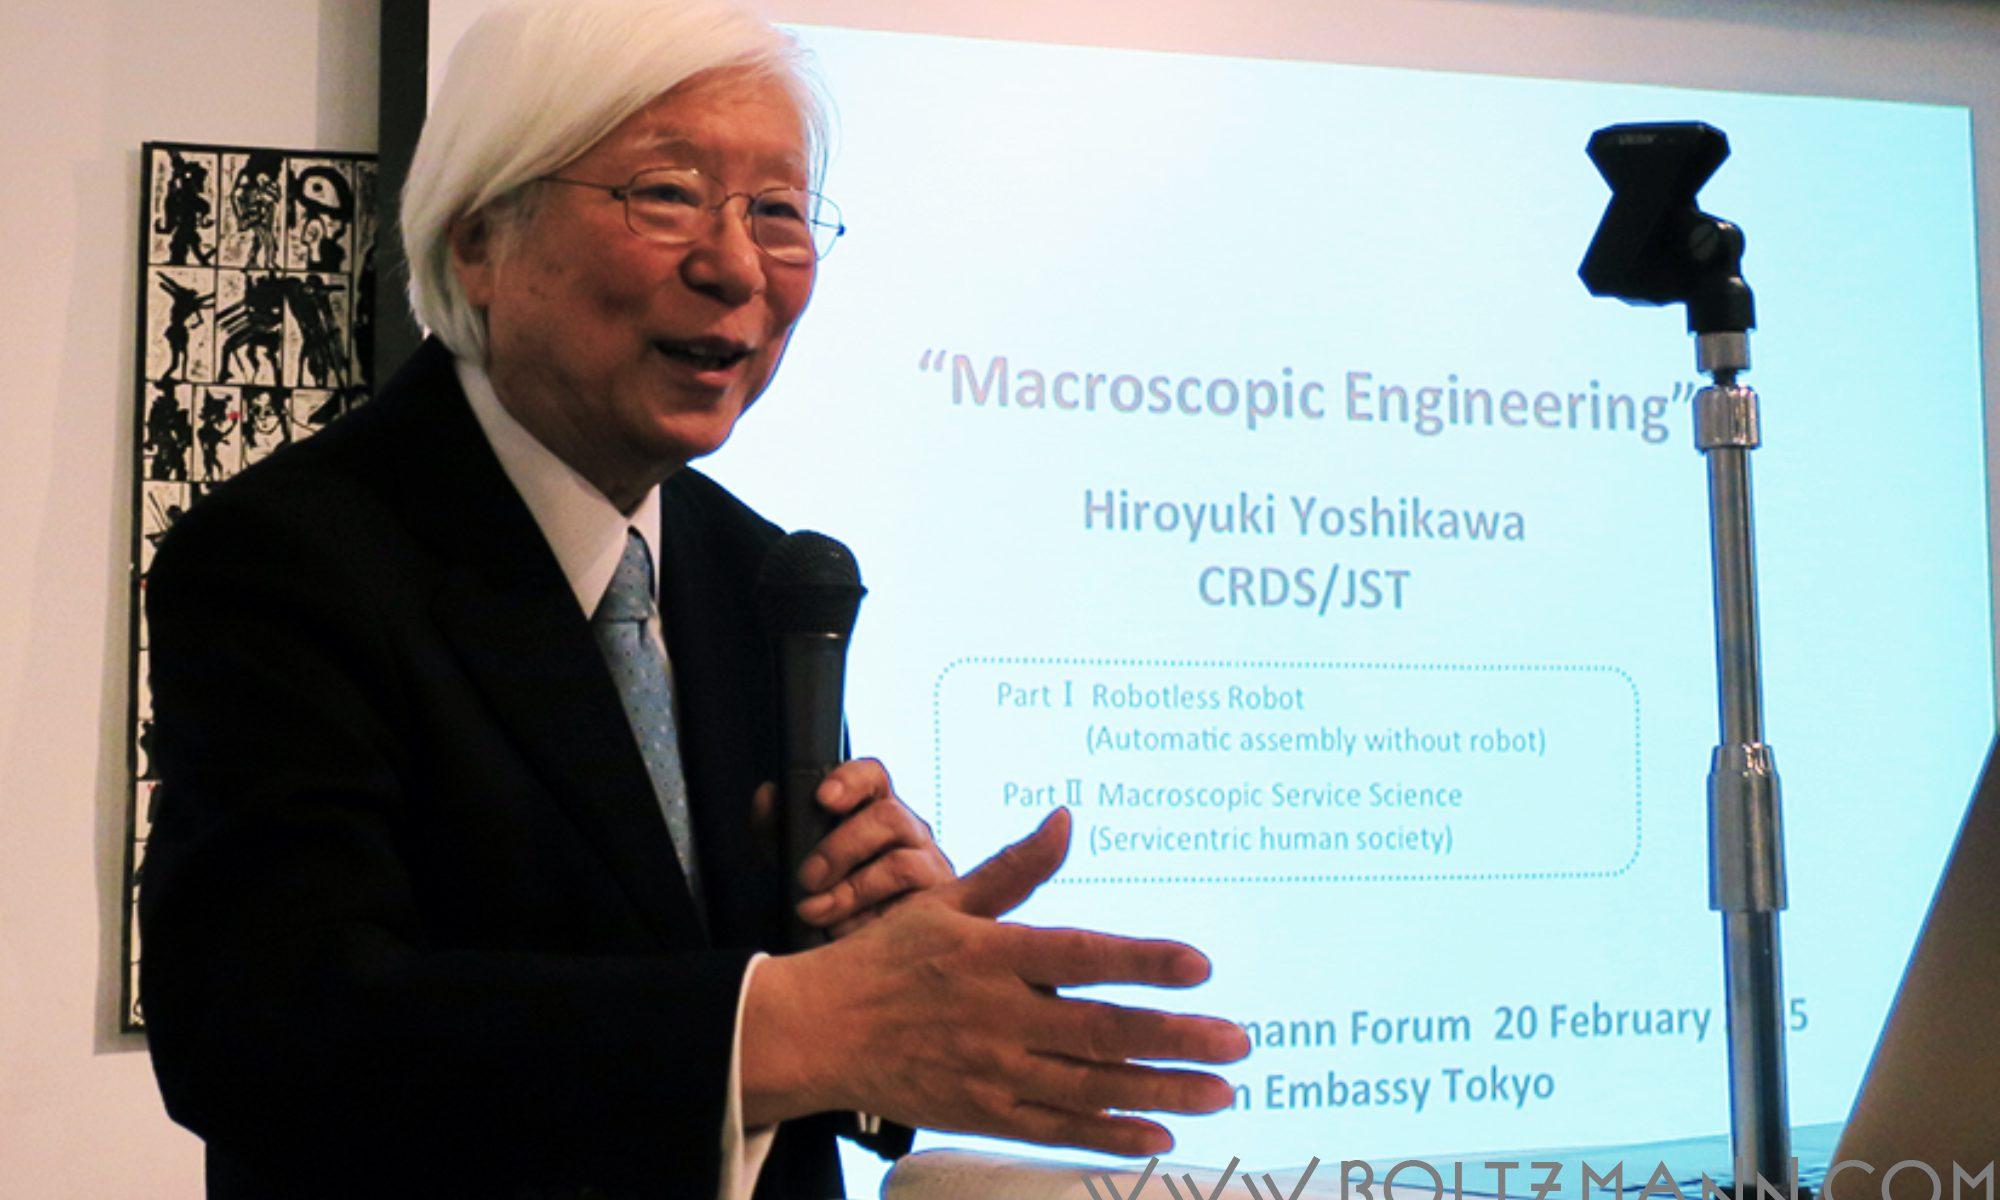 Hiroyuki Yoshikawa, Pioneer of robotics and precision manufacturing, Emeritus President of the University of Tokyo, Japan Prize 1997